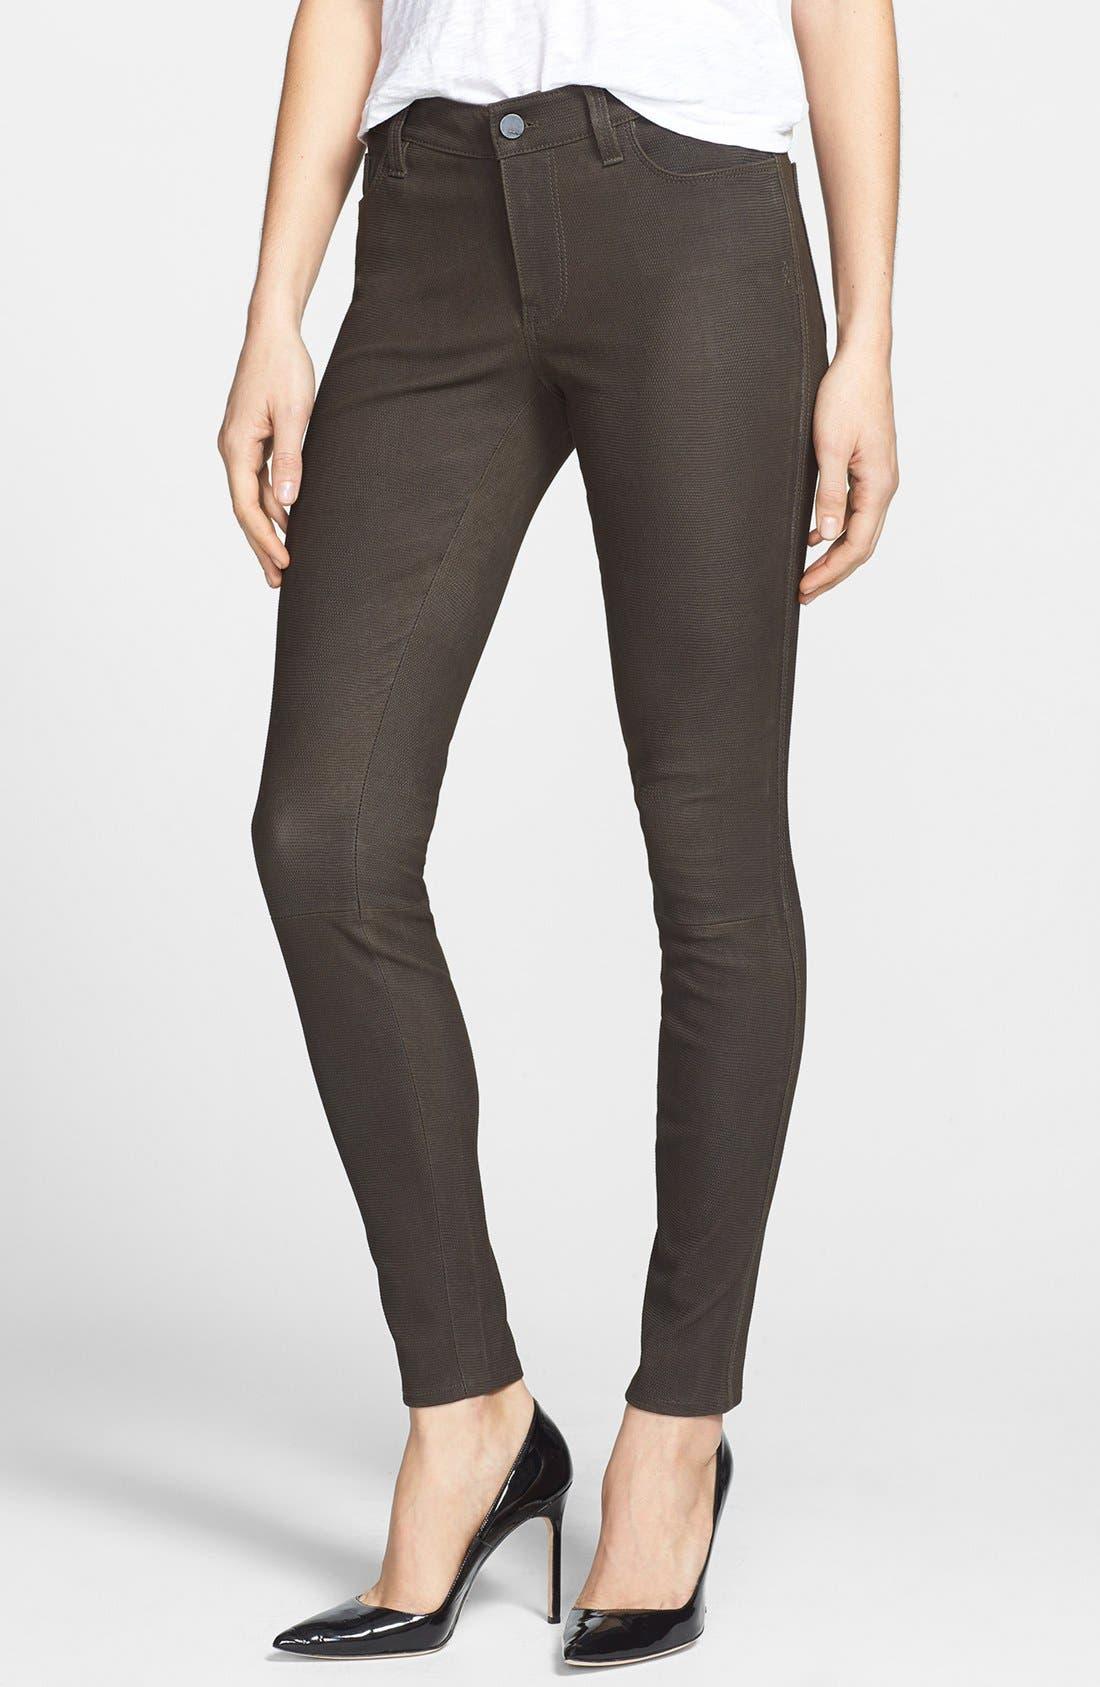 Main Image - Genetic 'Shya' Suede Cigarette Jeans (Deep Olive)